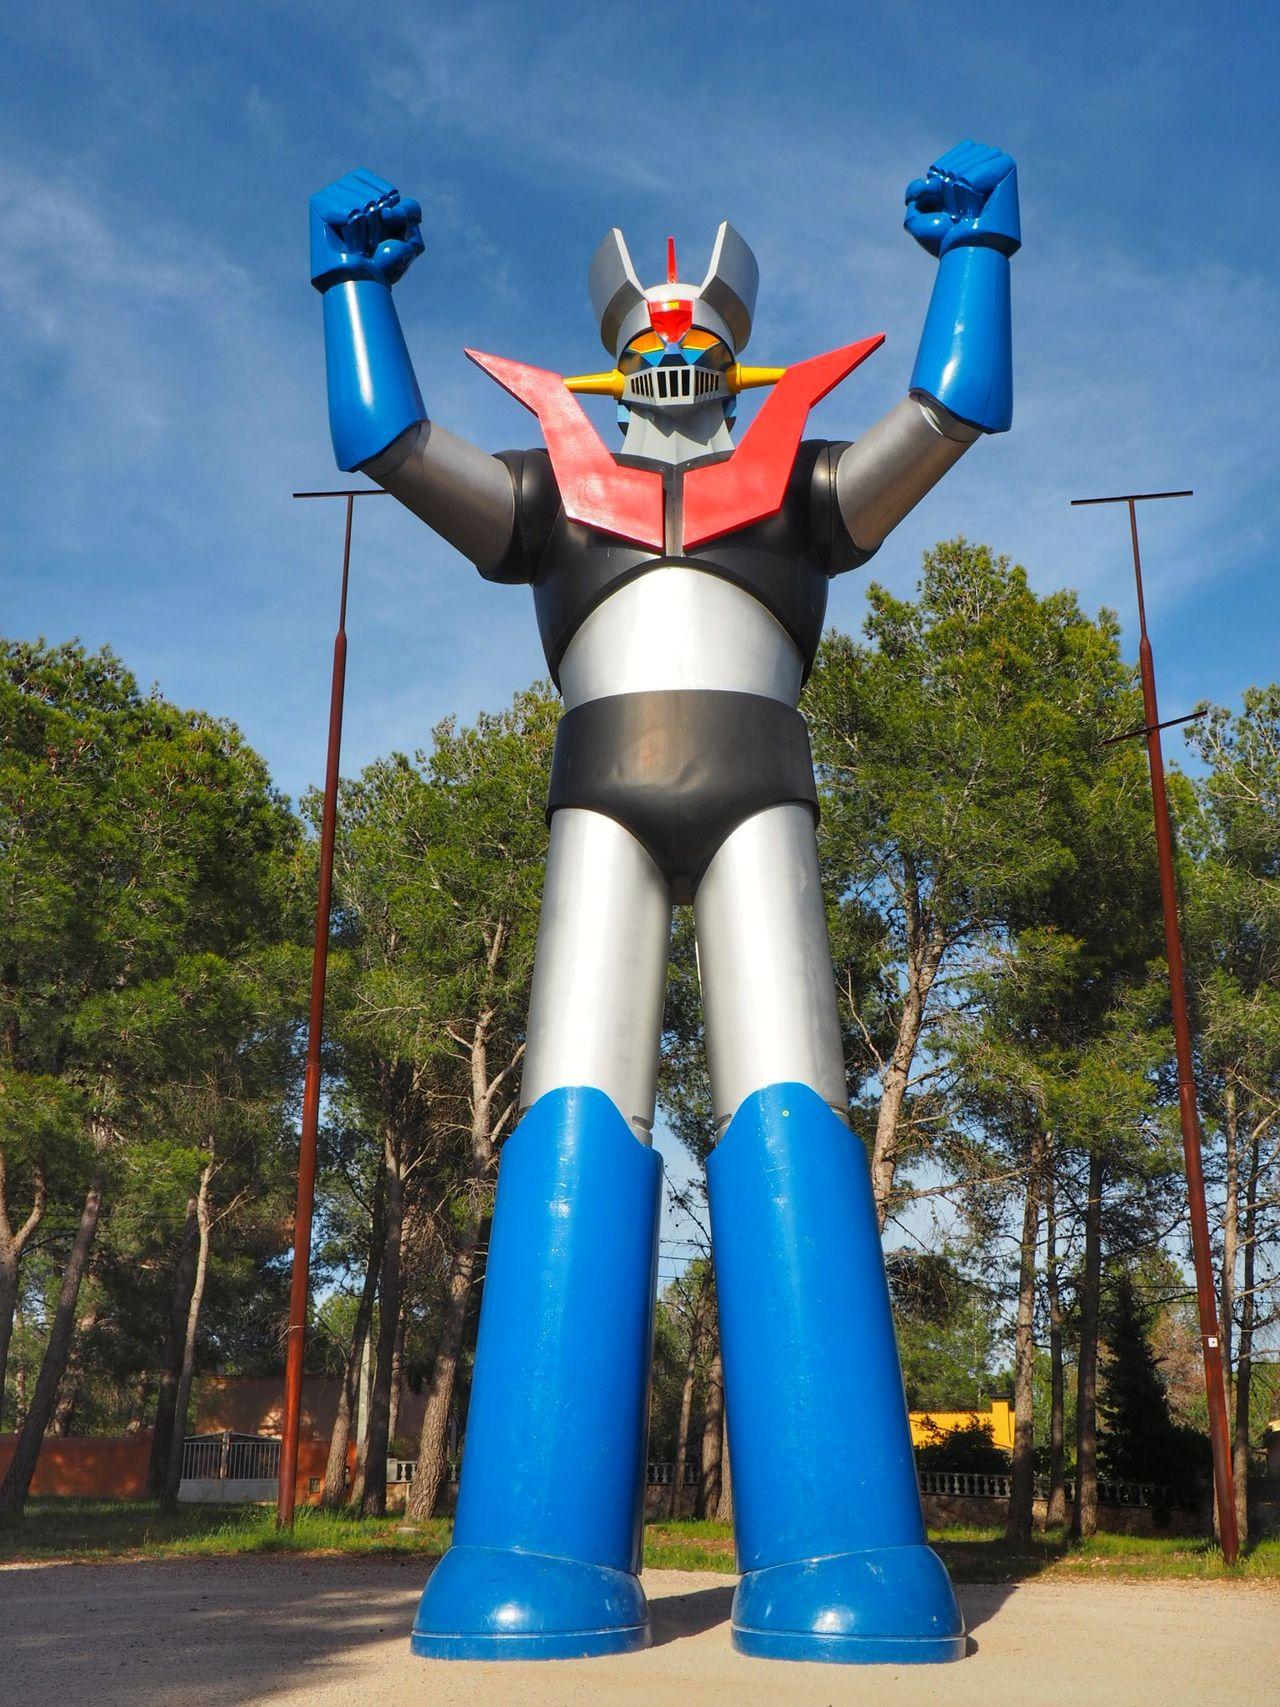 Mazinger Z Mazinger Z Freakday Freaky Sculture Robot Robot Love Epic Gigant Amazing Architecture